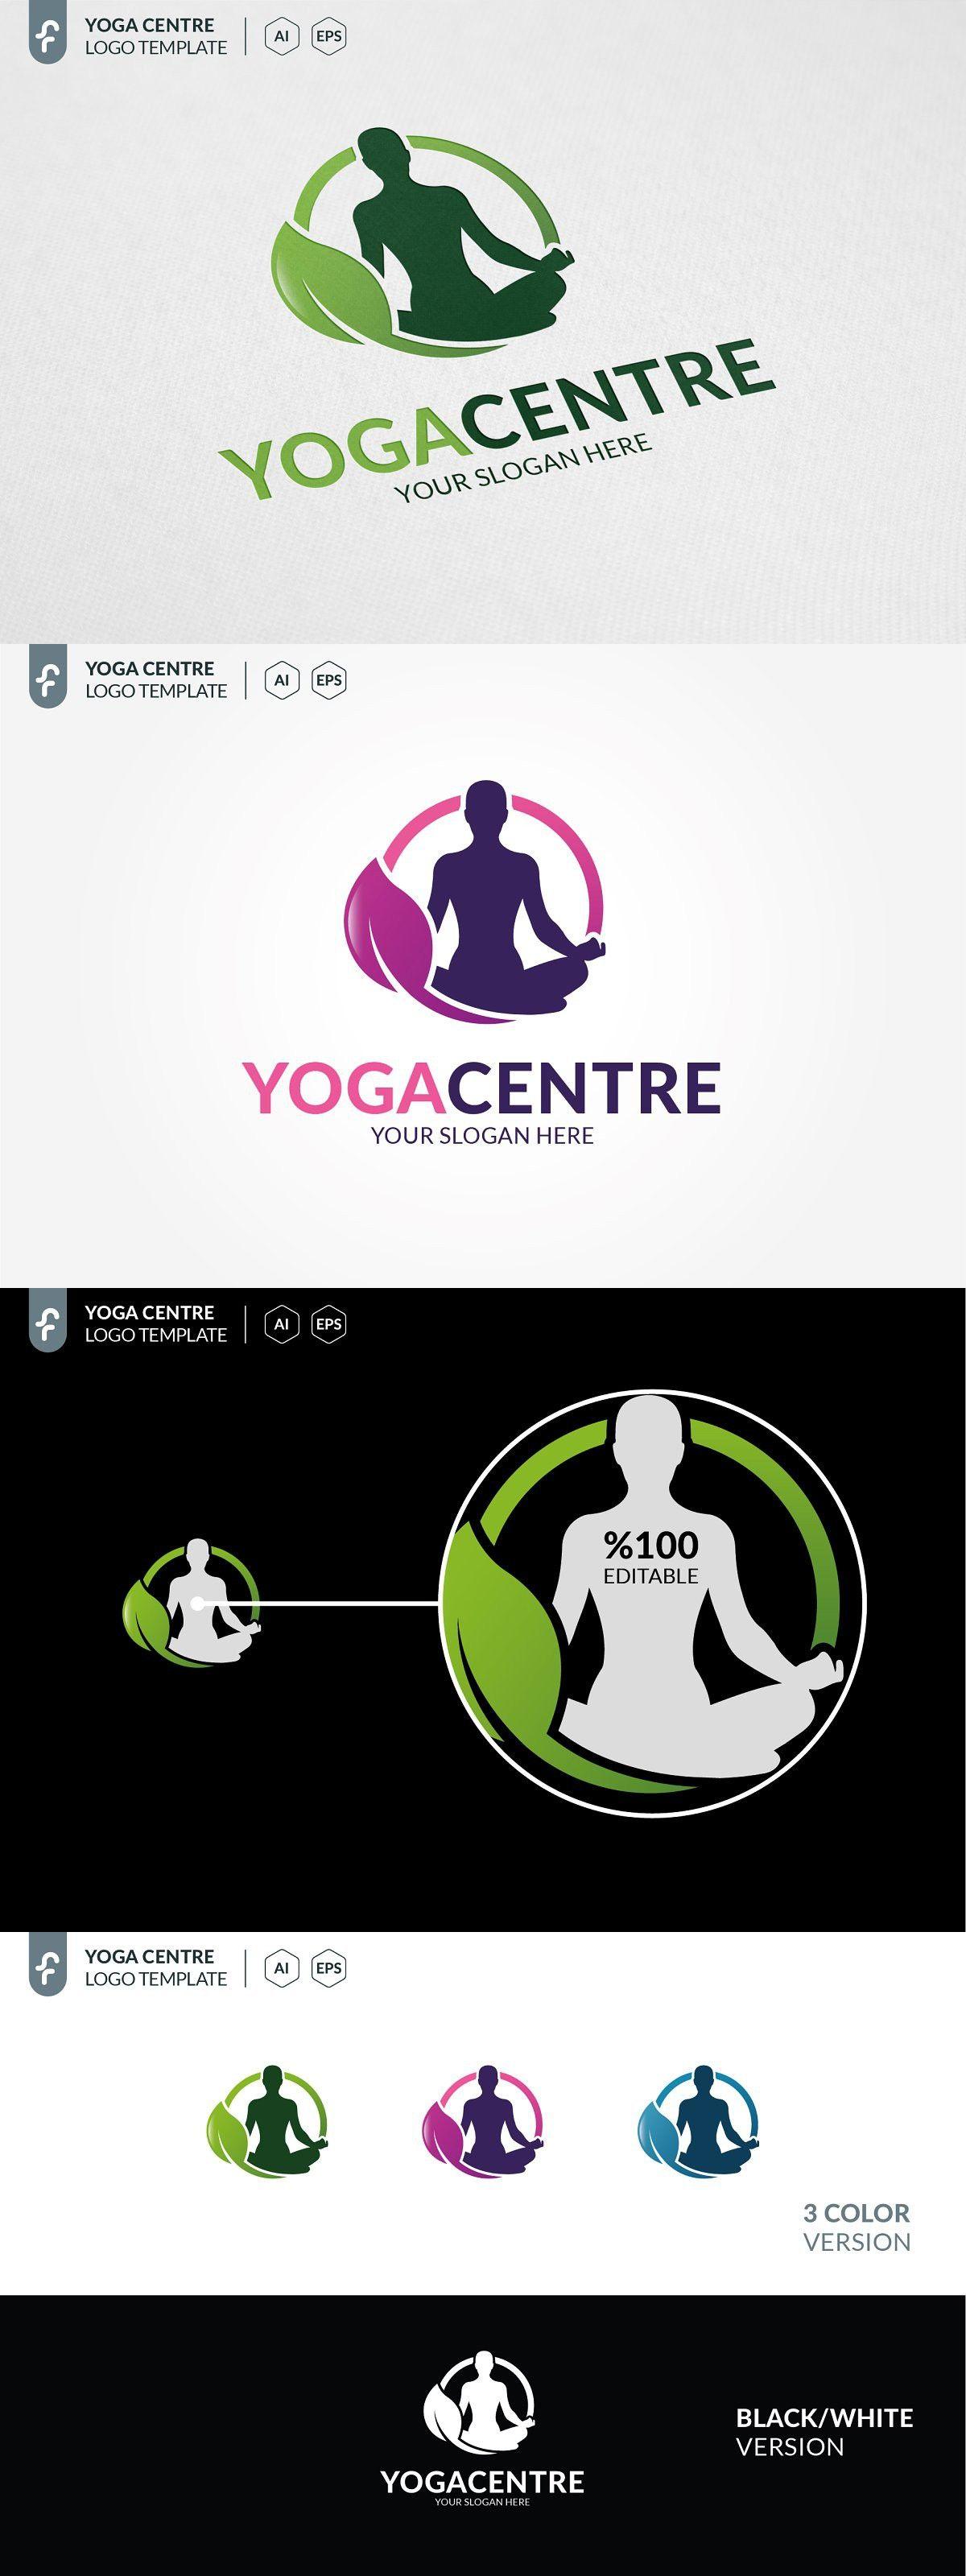 Yoga Centre Logo in 2020 Yoga design, Modern logo, Yoga